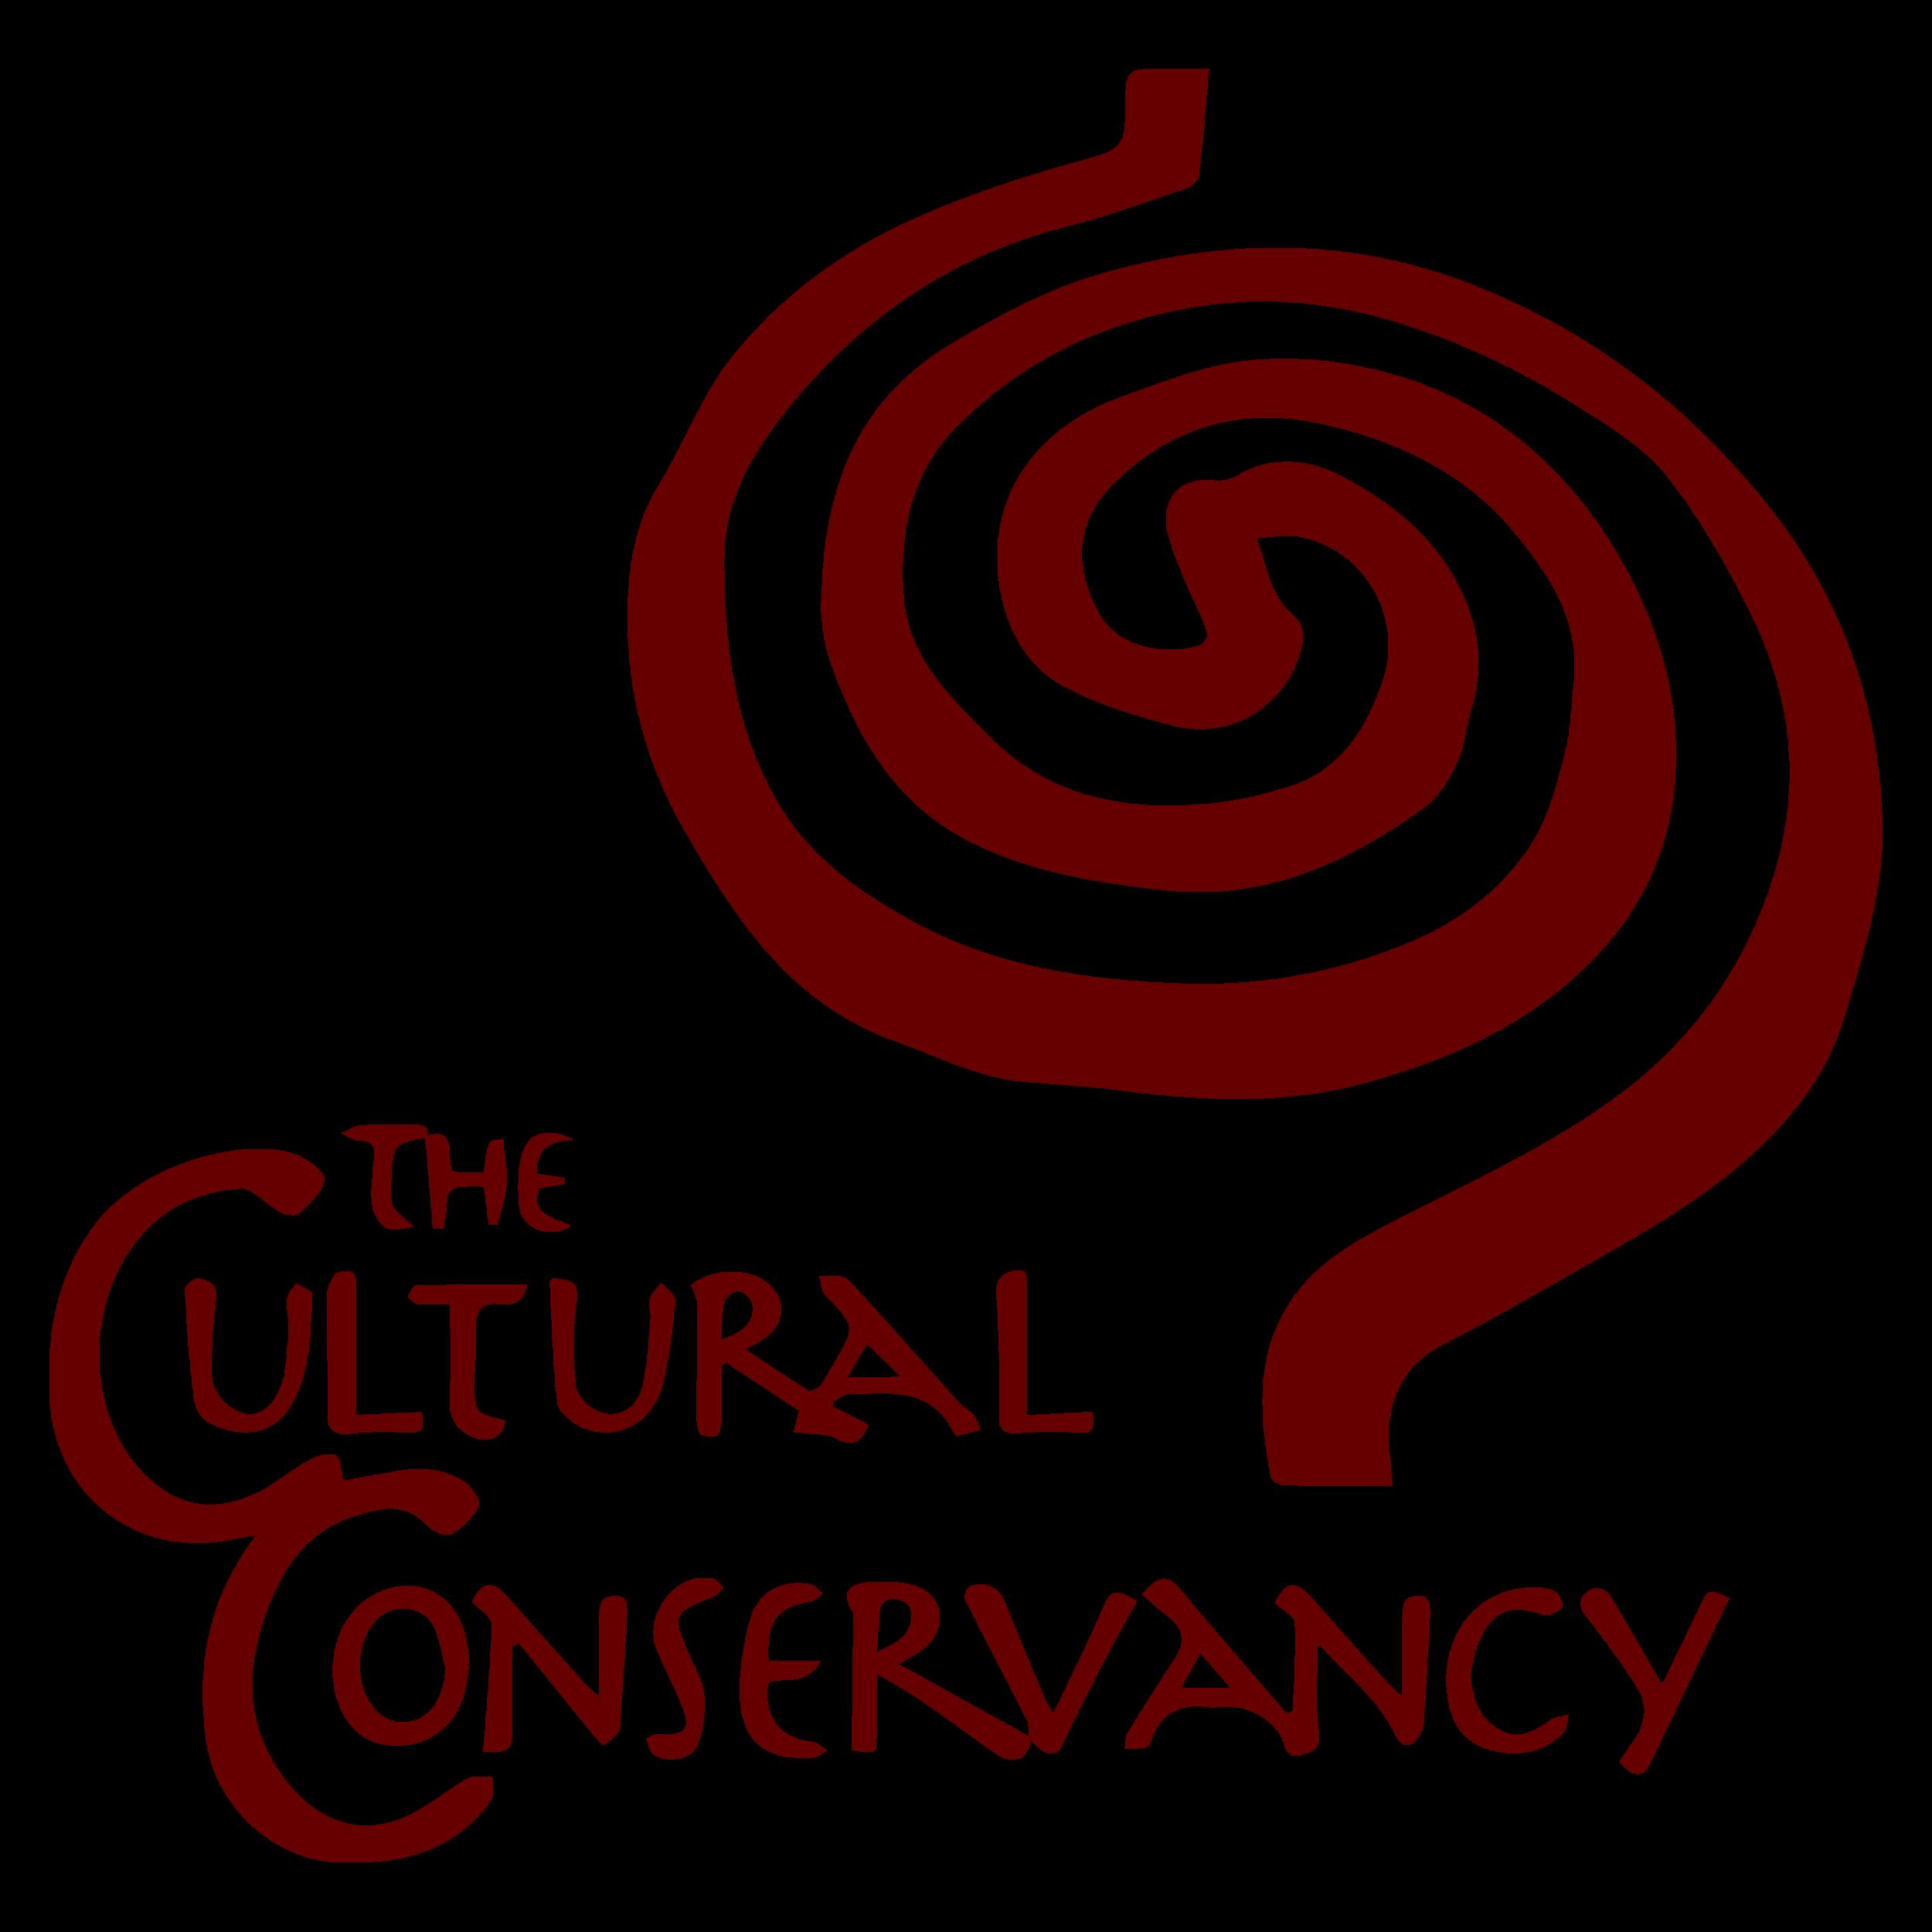 TCC logo red vert.png